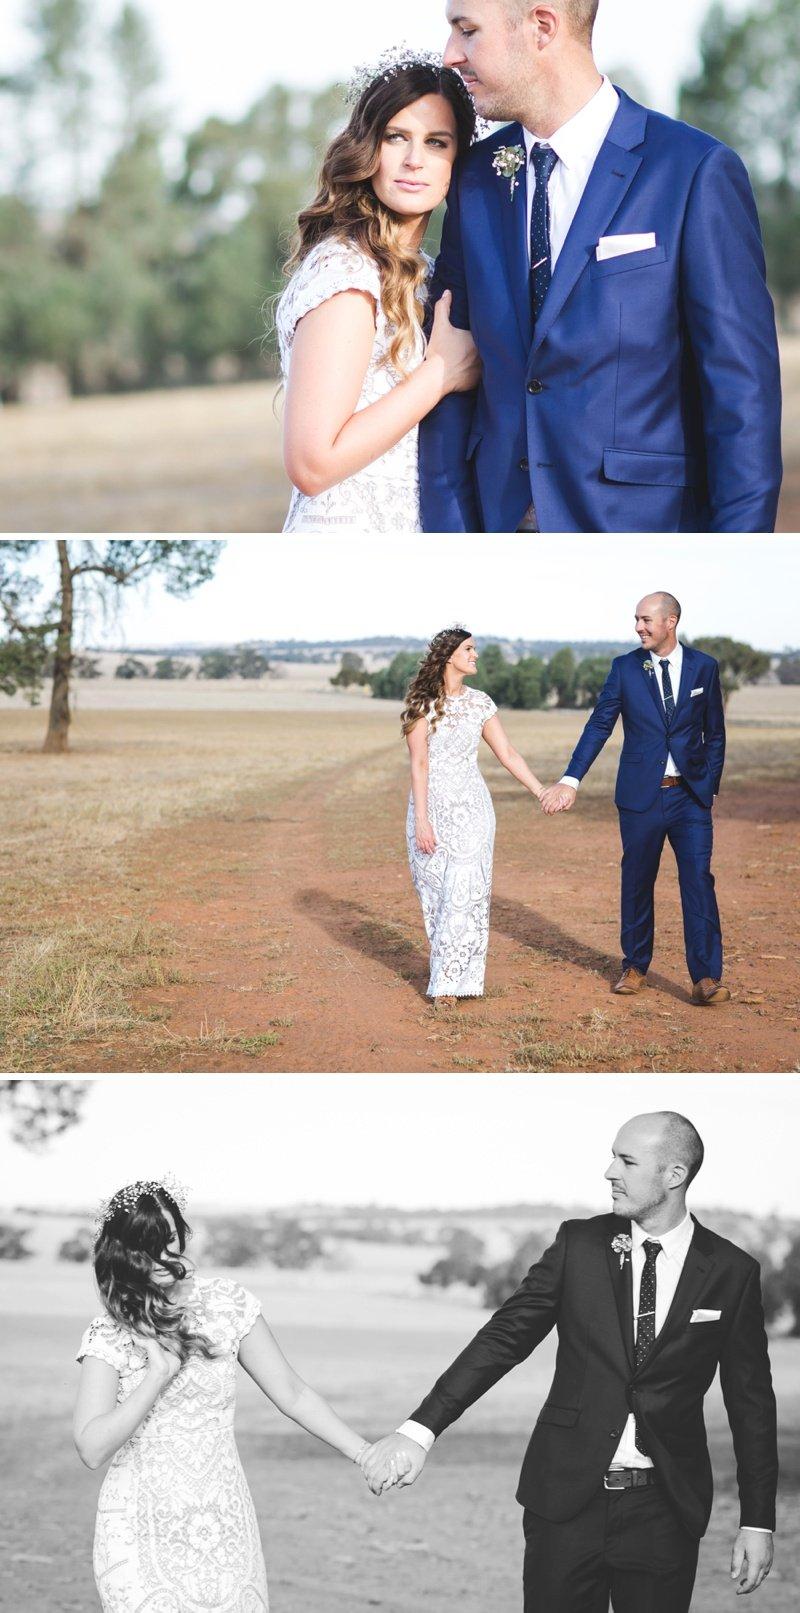 Wagga Wagga Wedding Photographer_Albury Wedding Photographer at Downside Hall Wagga Wagga__0017